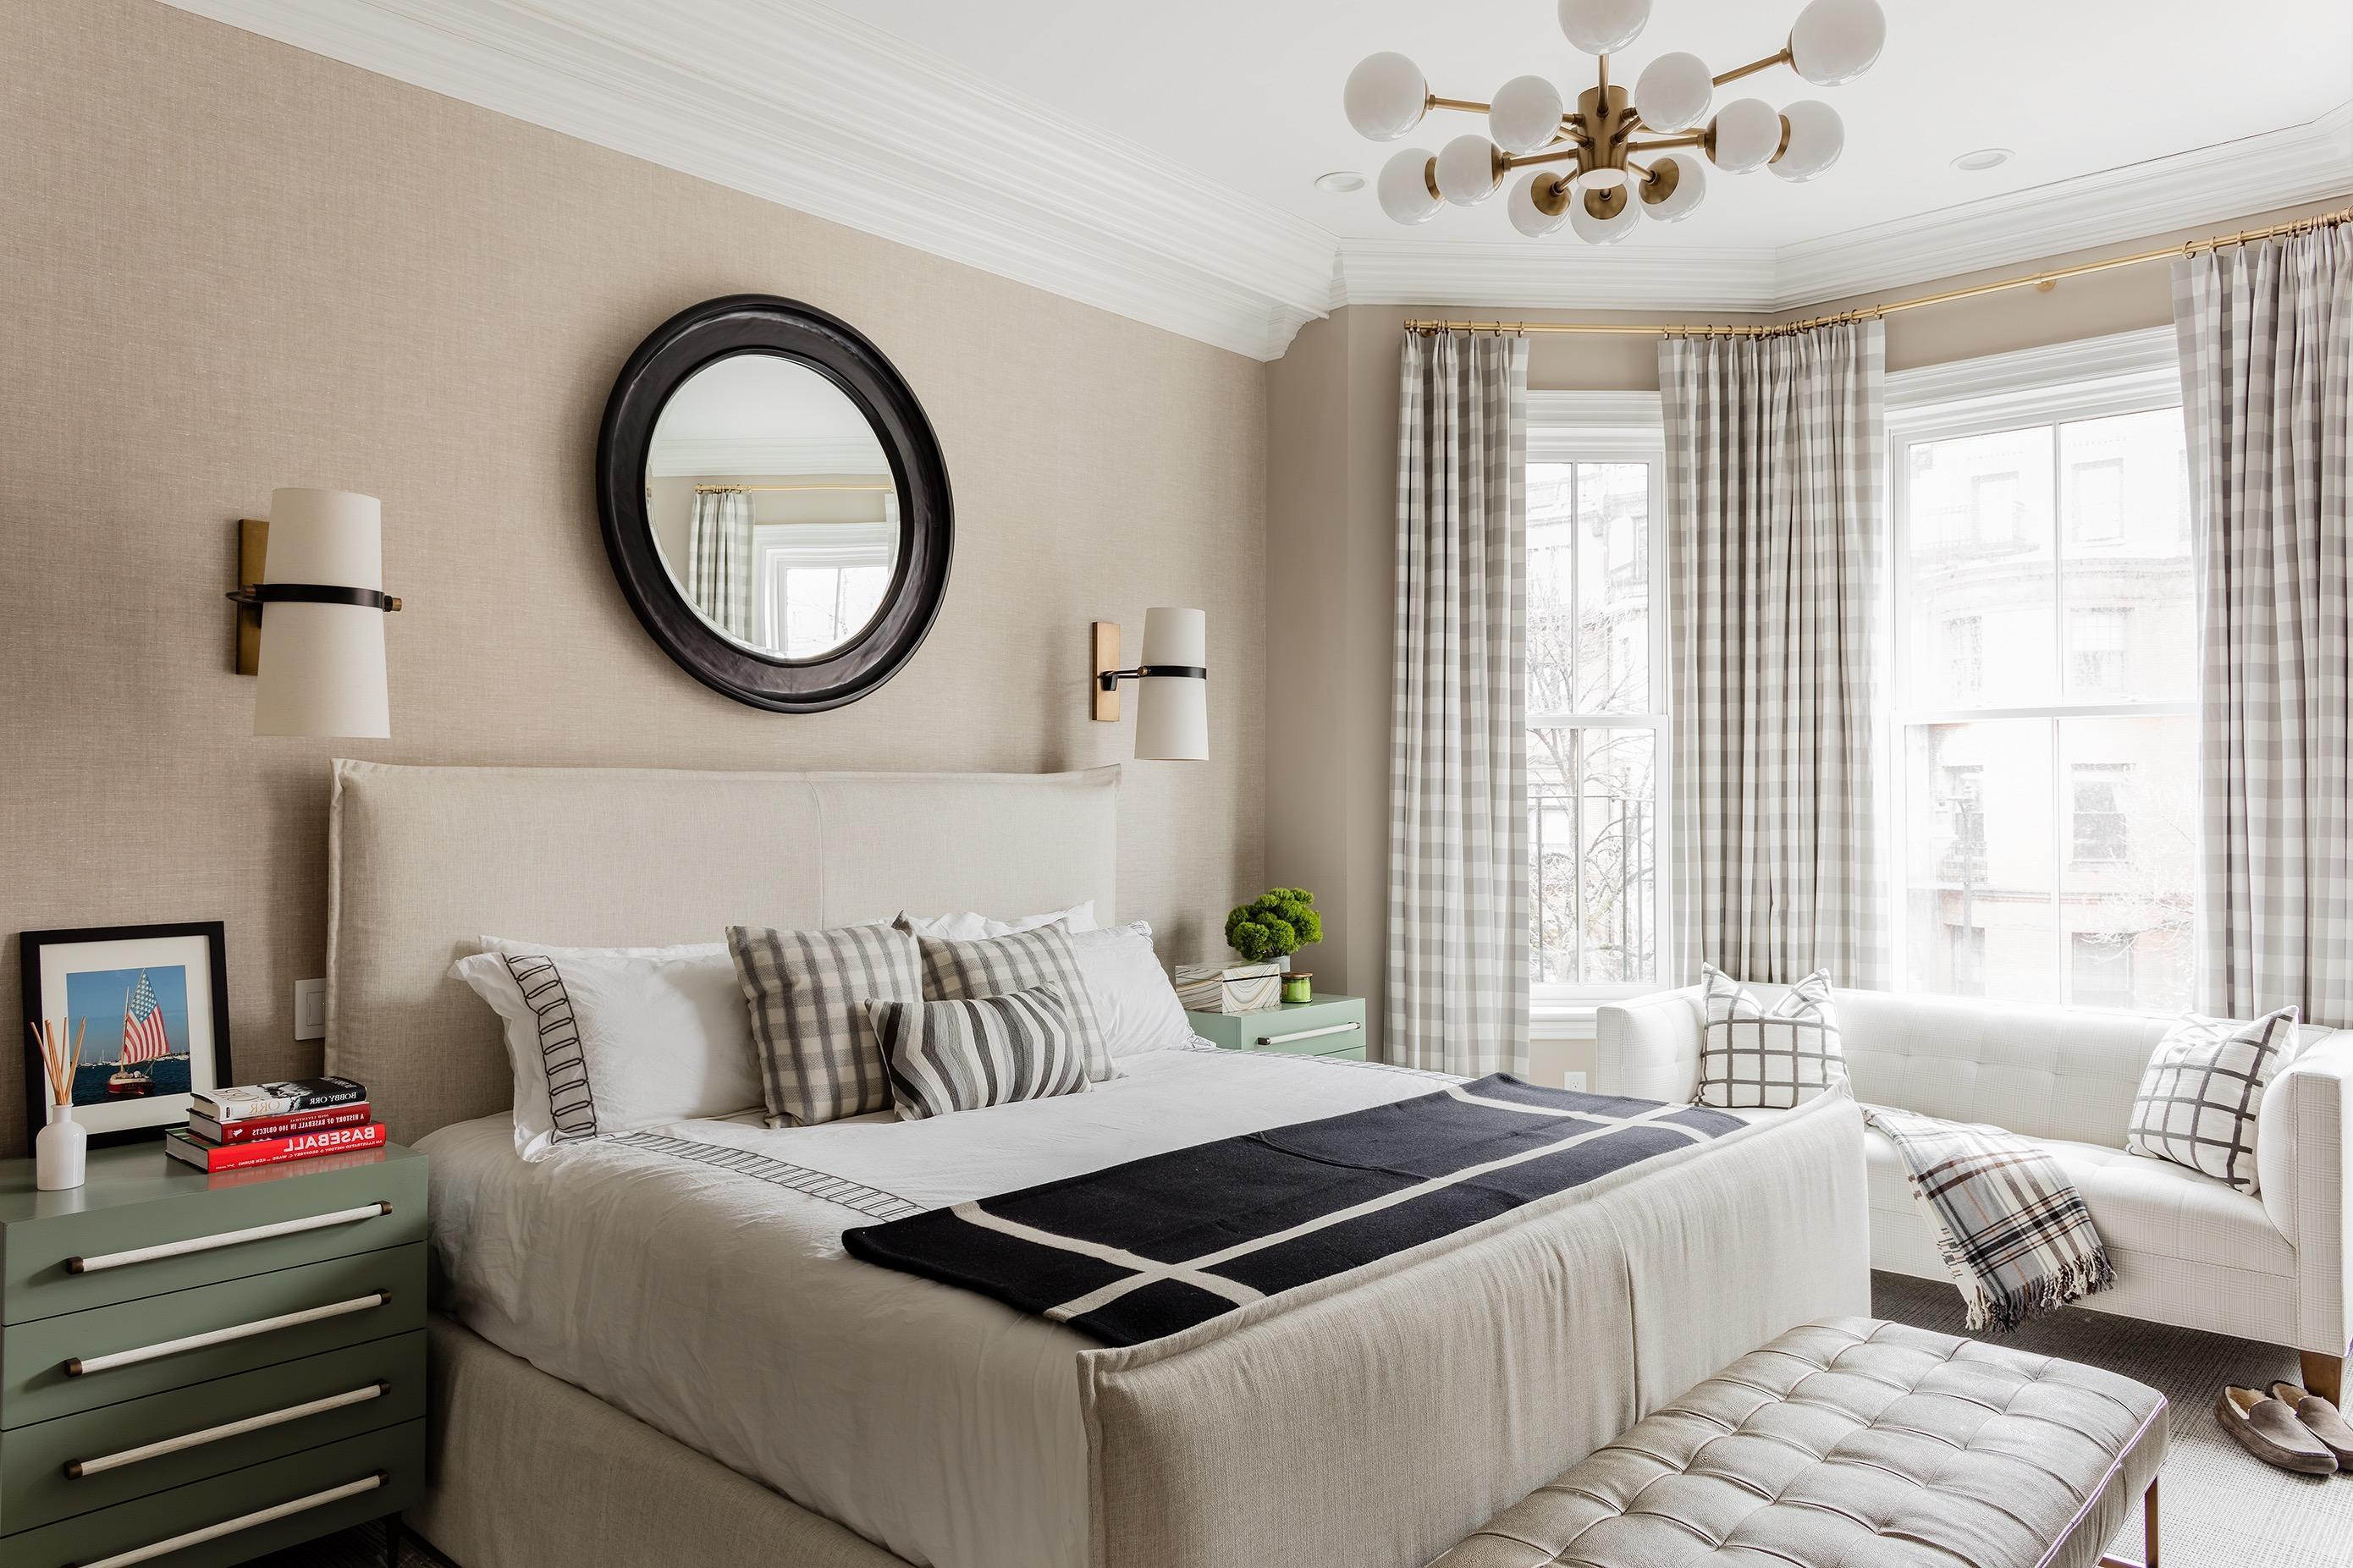 Bedroom Furniture : Bedroom Sofa Set Latest Bedroom Sofa Designs In Bedroom Sofas And Chairs (Image 2 of 20)